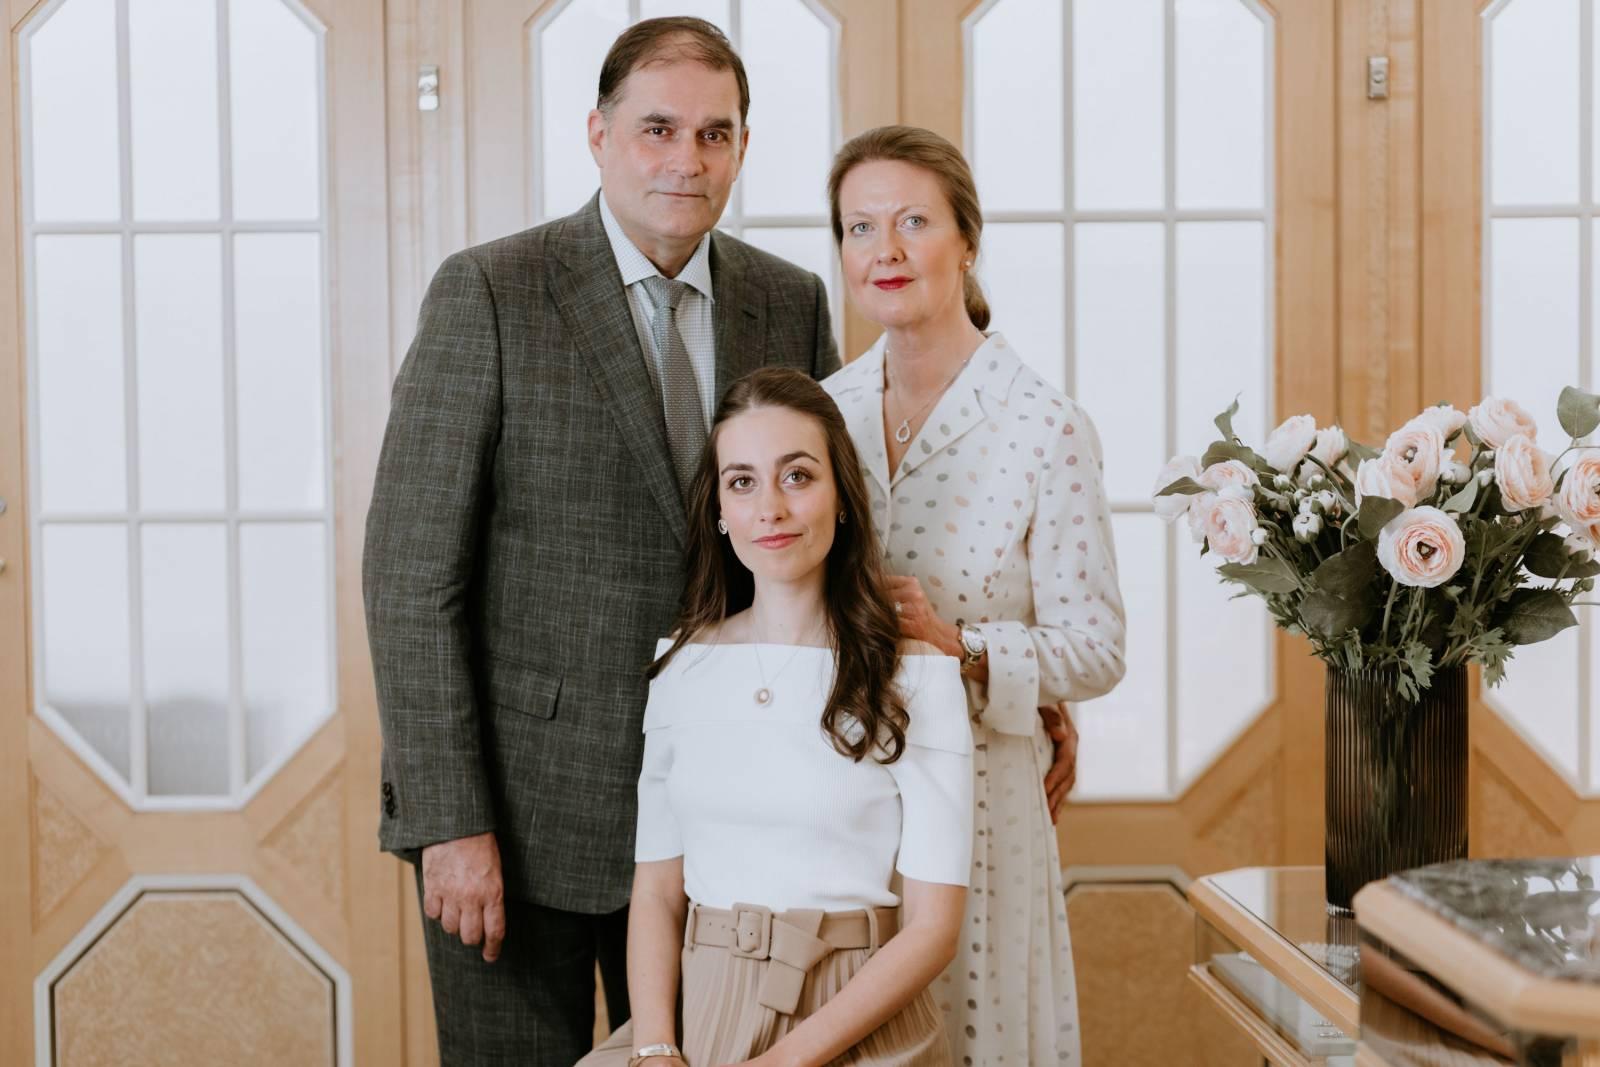 Scaldis_Fotograaf_Darina Miro_Familiefoto1 - House of Weddings